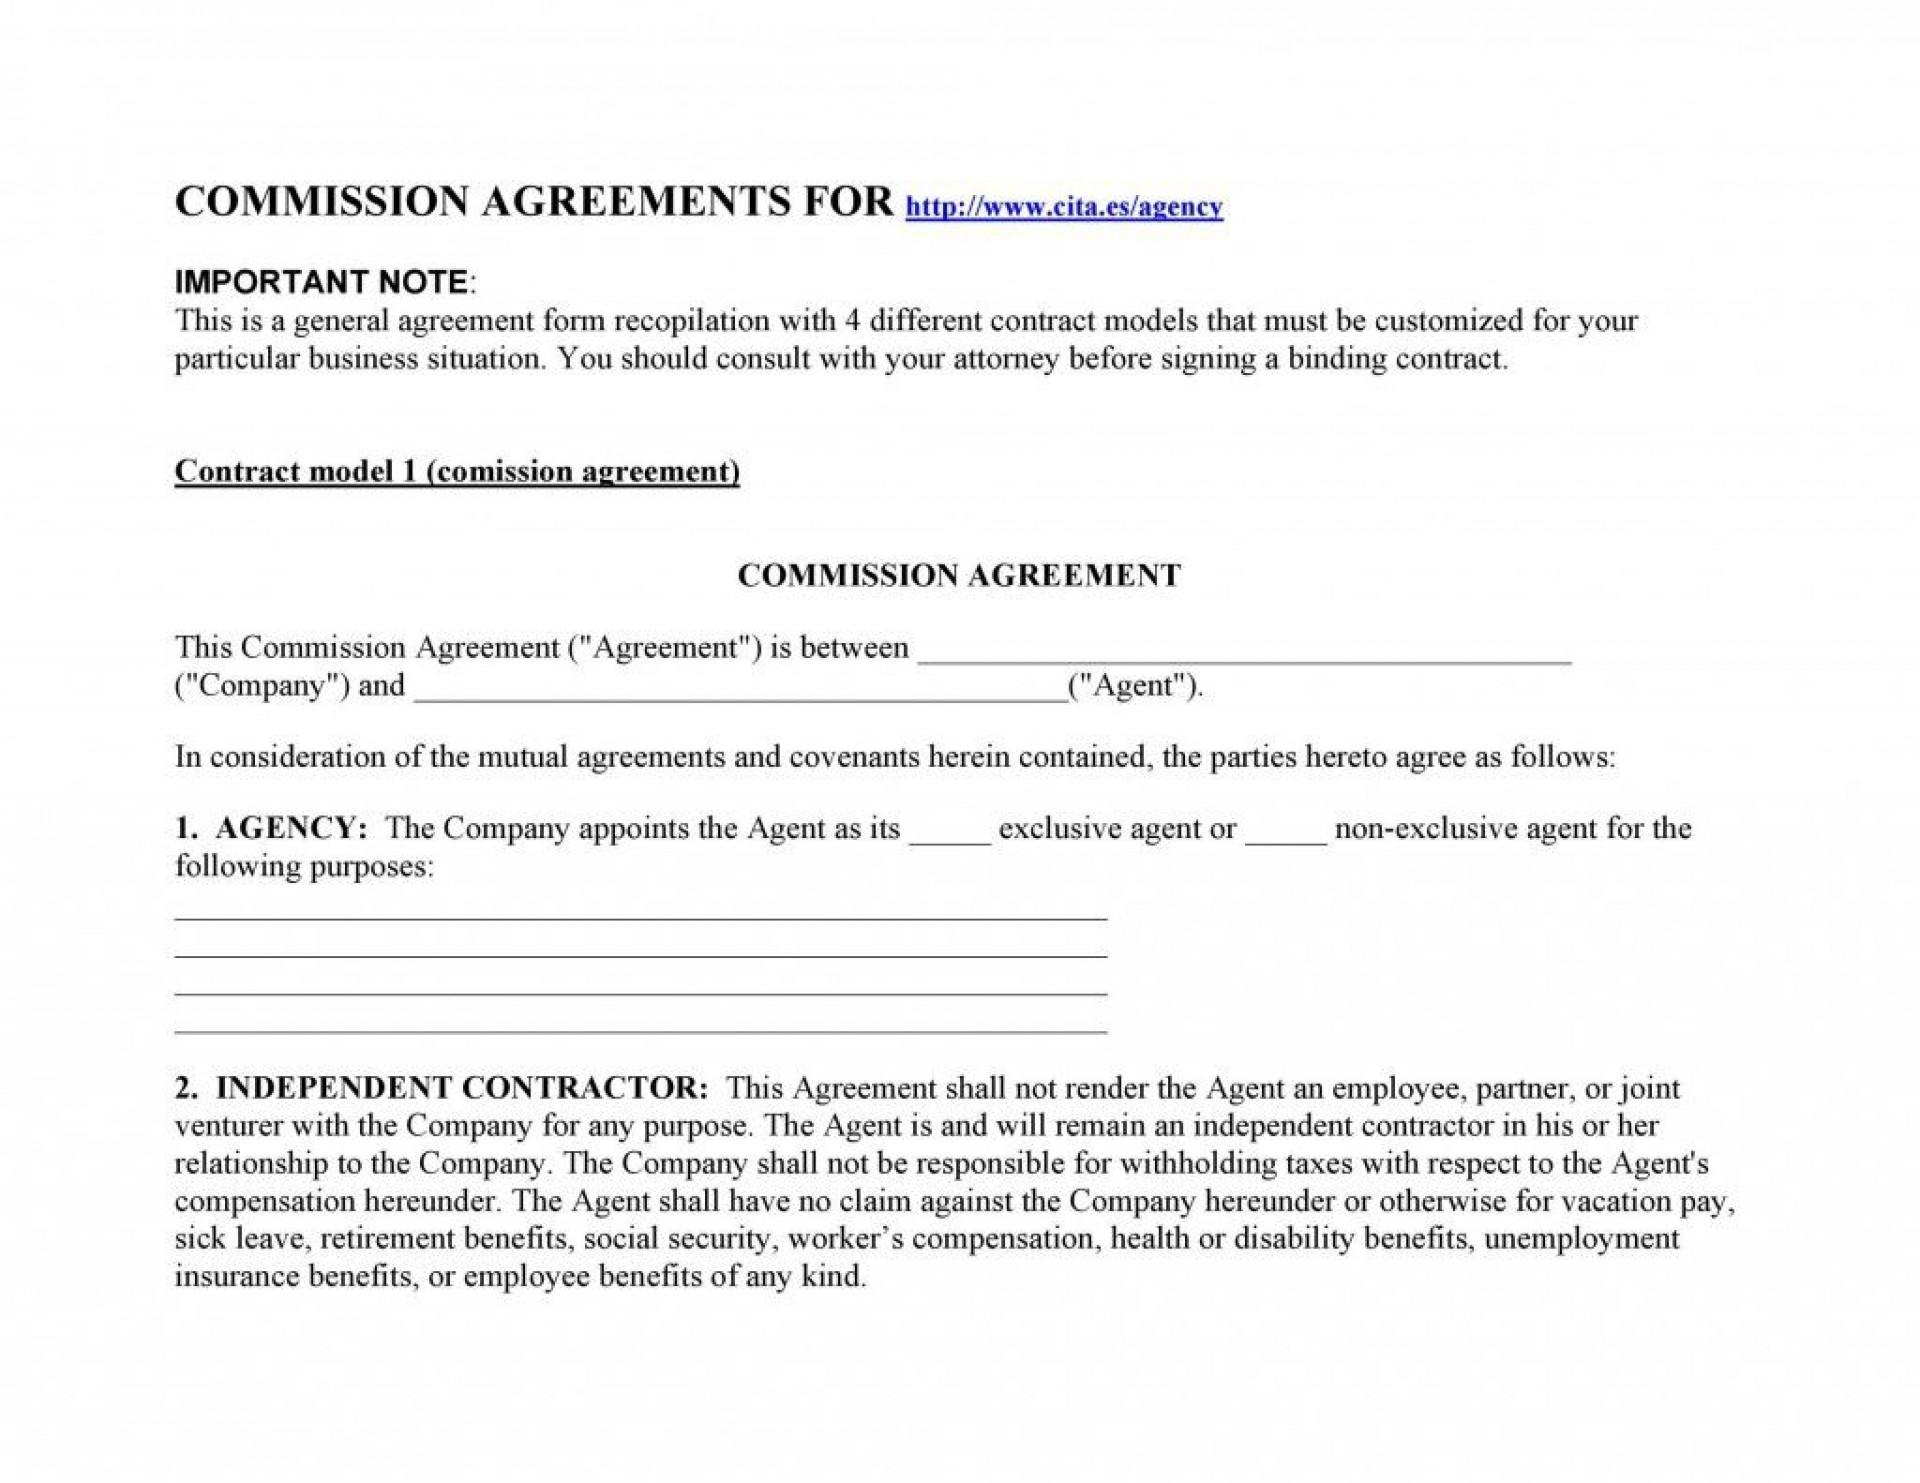 009 Magnificent Sale Agreement Template Australia Highest Clarity  Busines Horse Car Contract1920